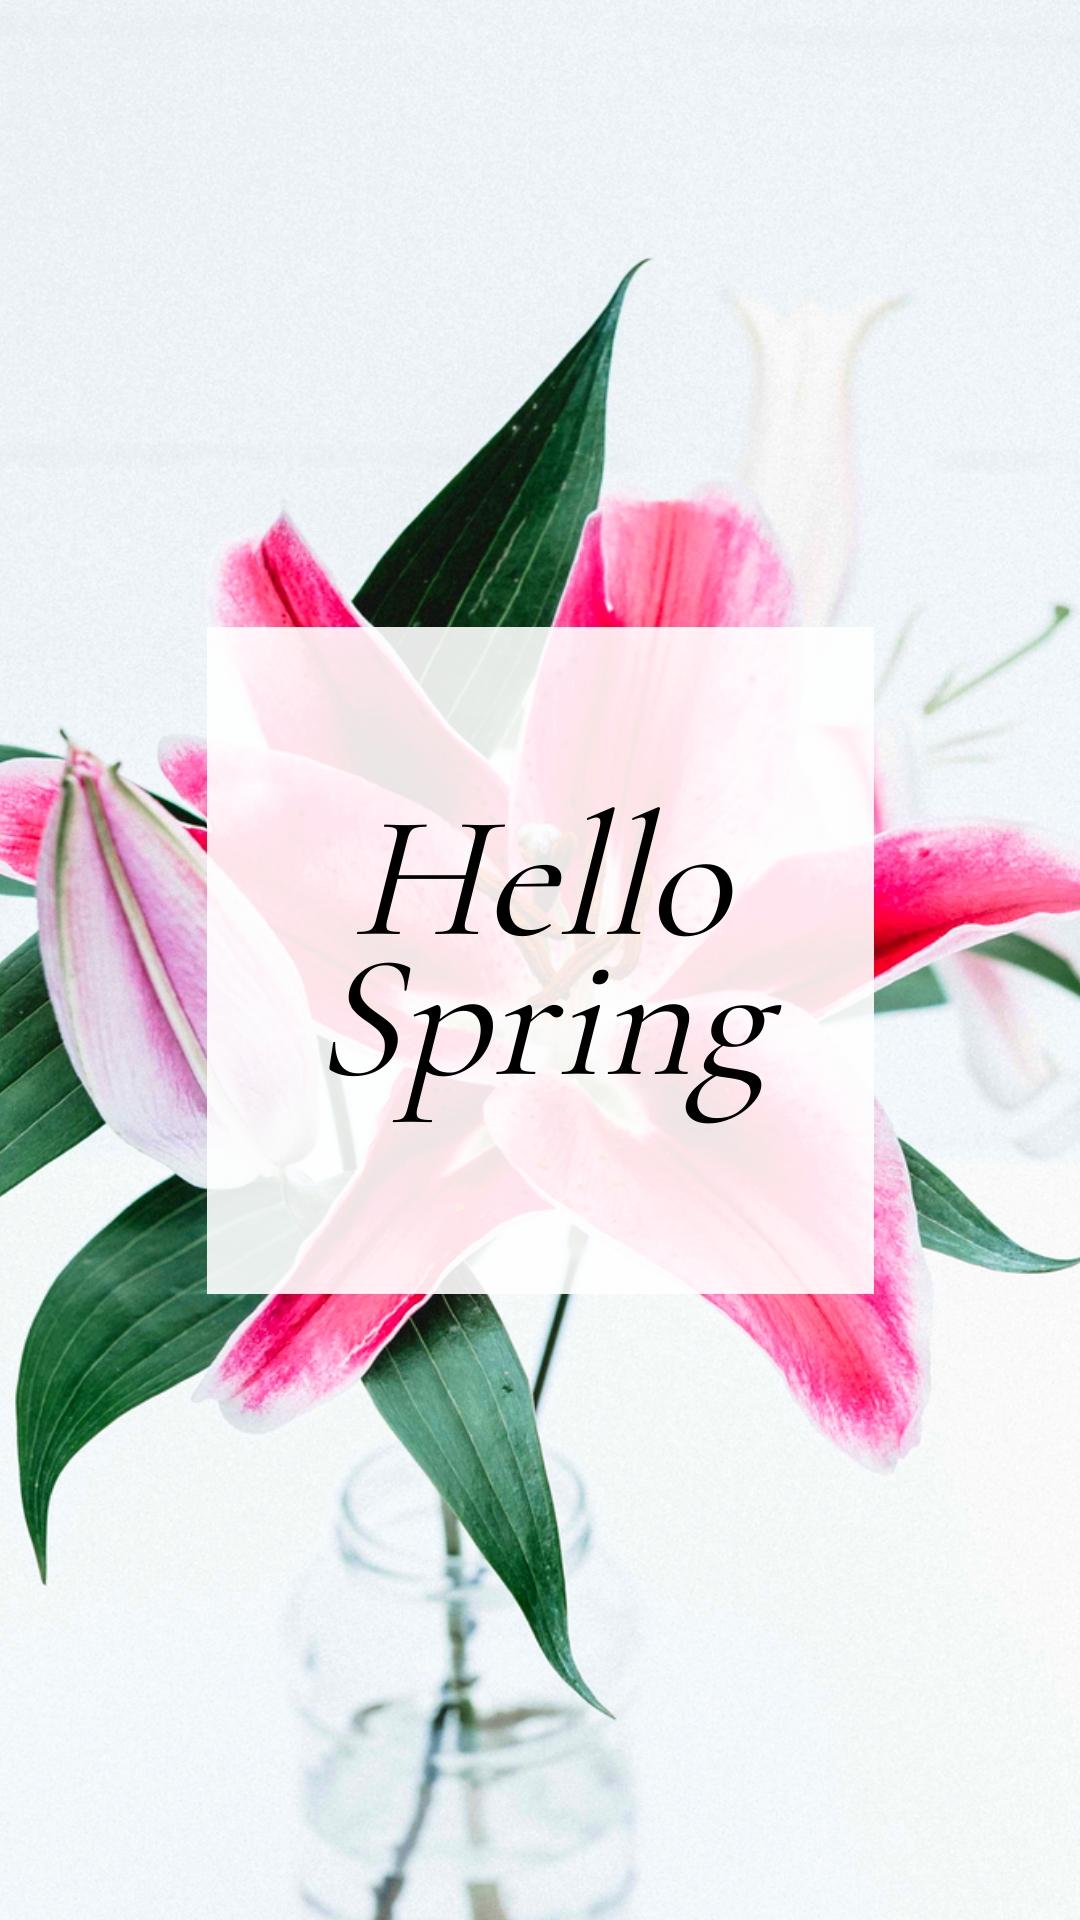 Hello Spring Phone Wallpaper Template